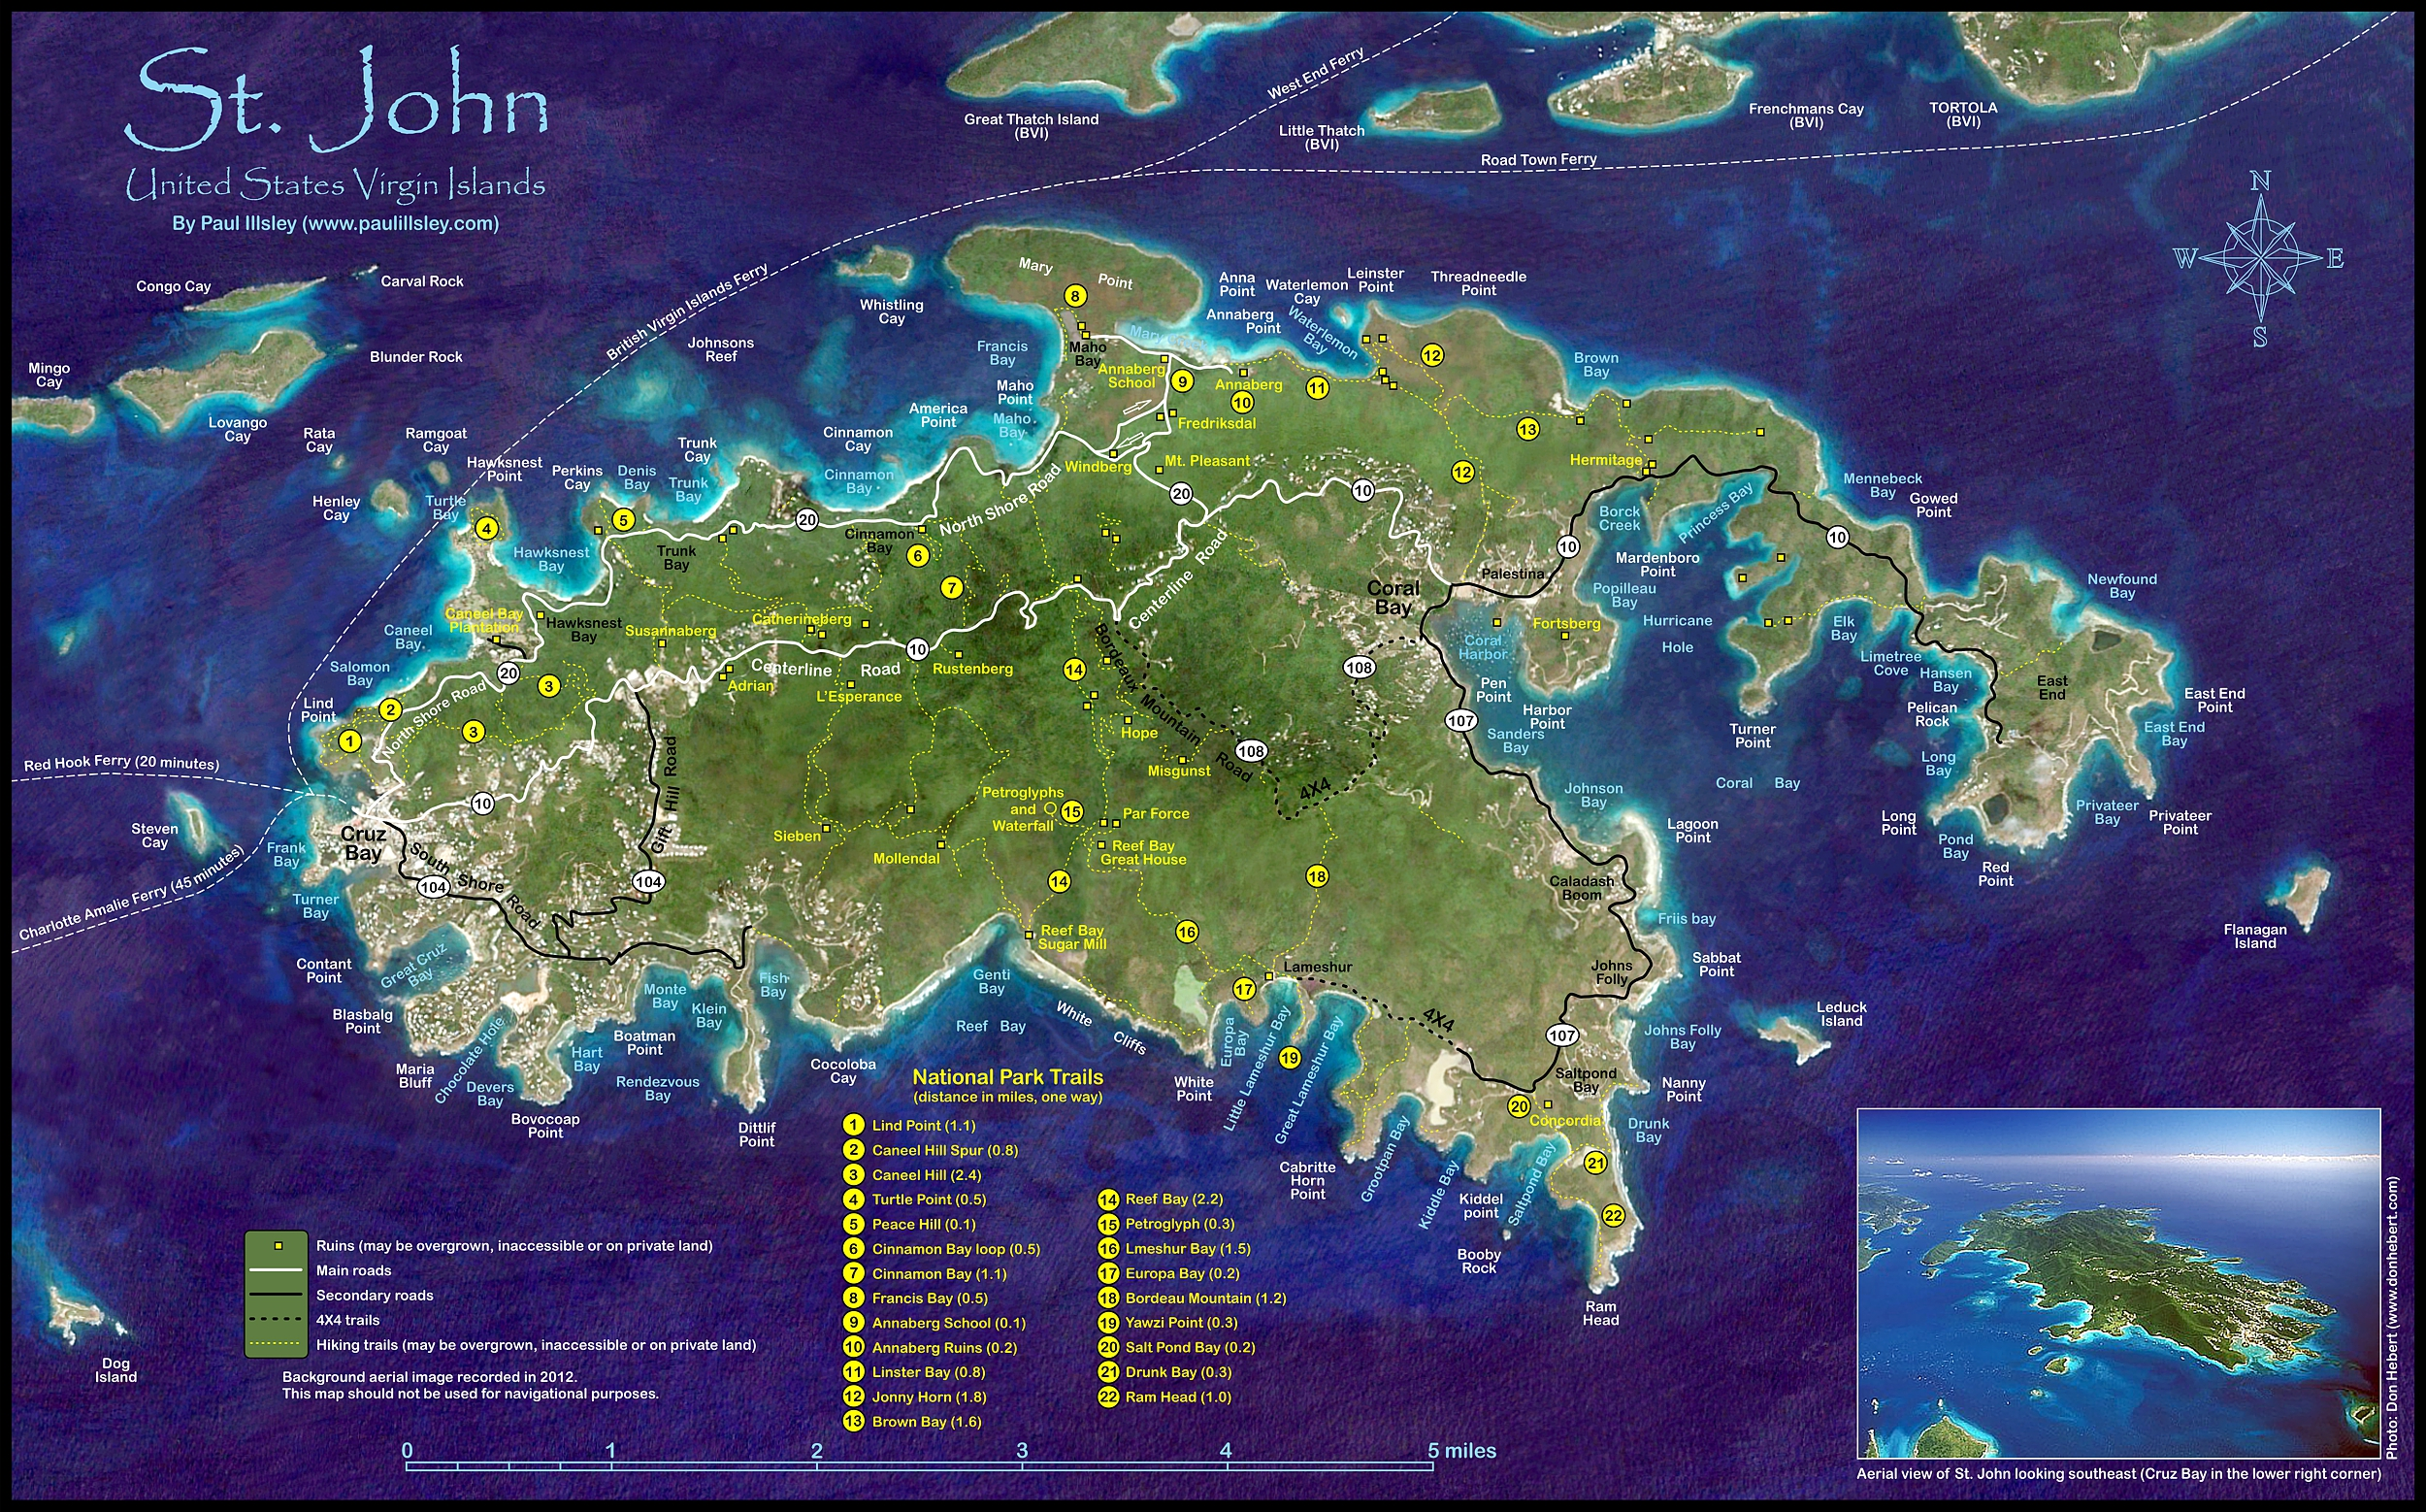 st johns virgin islands map with Usvi on St Thomas together with St John Us Virgin Islands Love City moreover D27 Ttd also San Juan Islands Washington Map together with Virgin Islands.